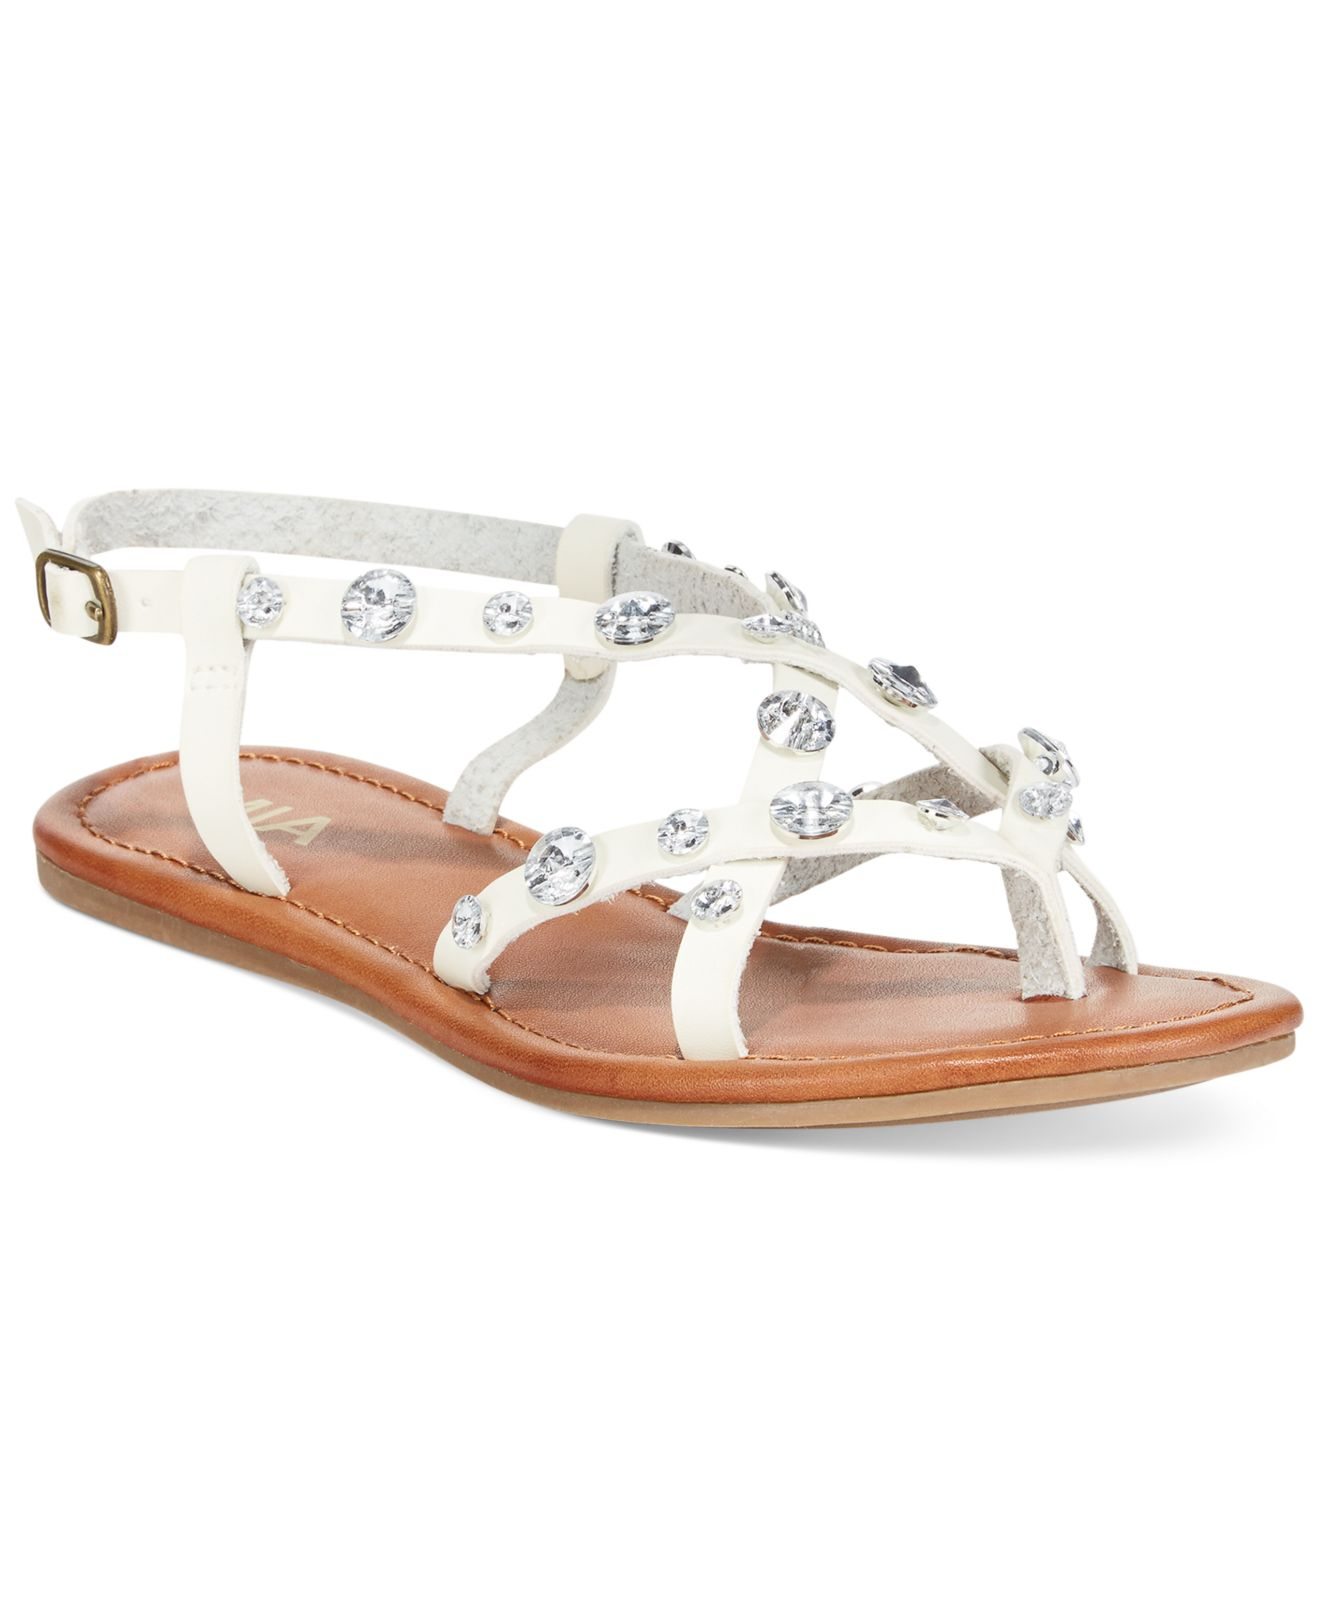 Lyst - Mia Peace Rhinestone Flat Sandals in White